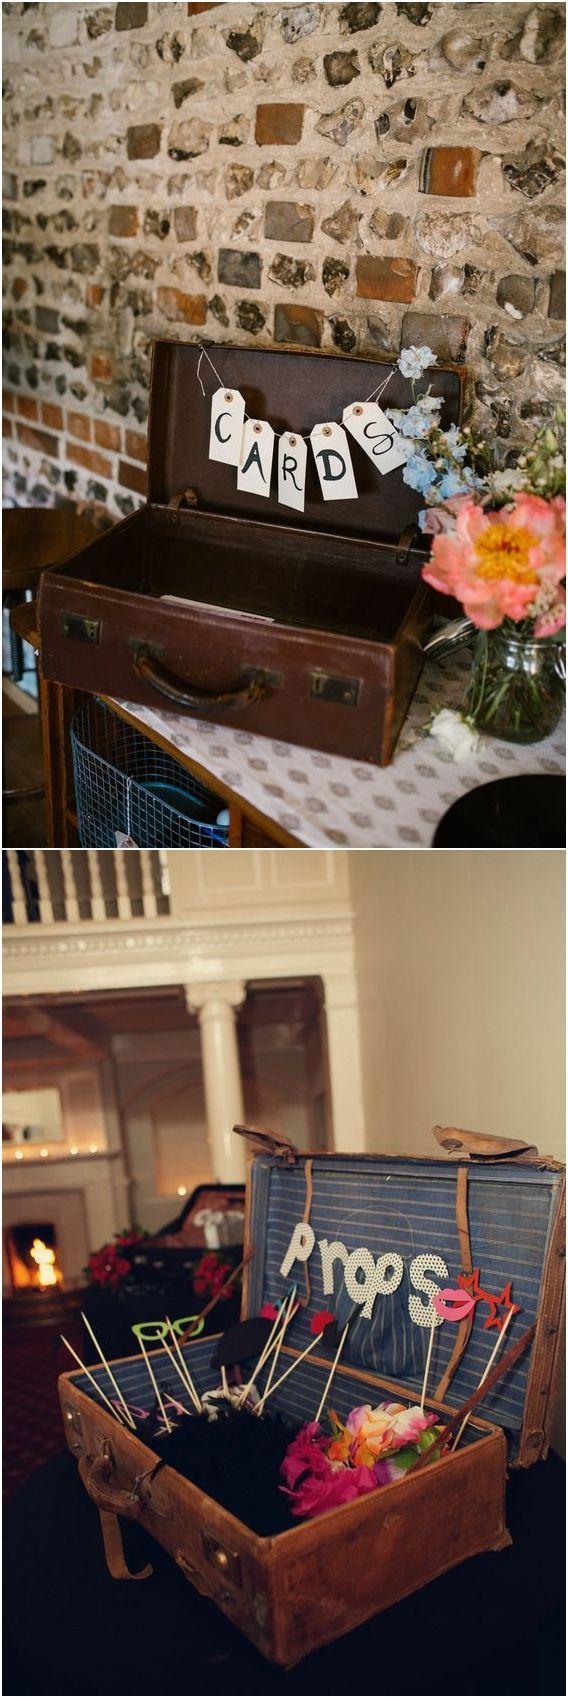 Top 20 Vintage Suitcase Wedding Decor Ideas #vintagesuitcasewedding Vintage suitcase wedding decor ideas #weddings #weddingdecor #weddingideas #weddinginspiration #vintageweddings #vintagesuitcasewedding